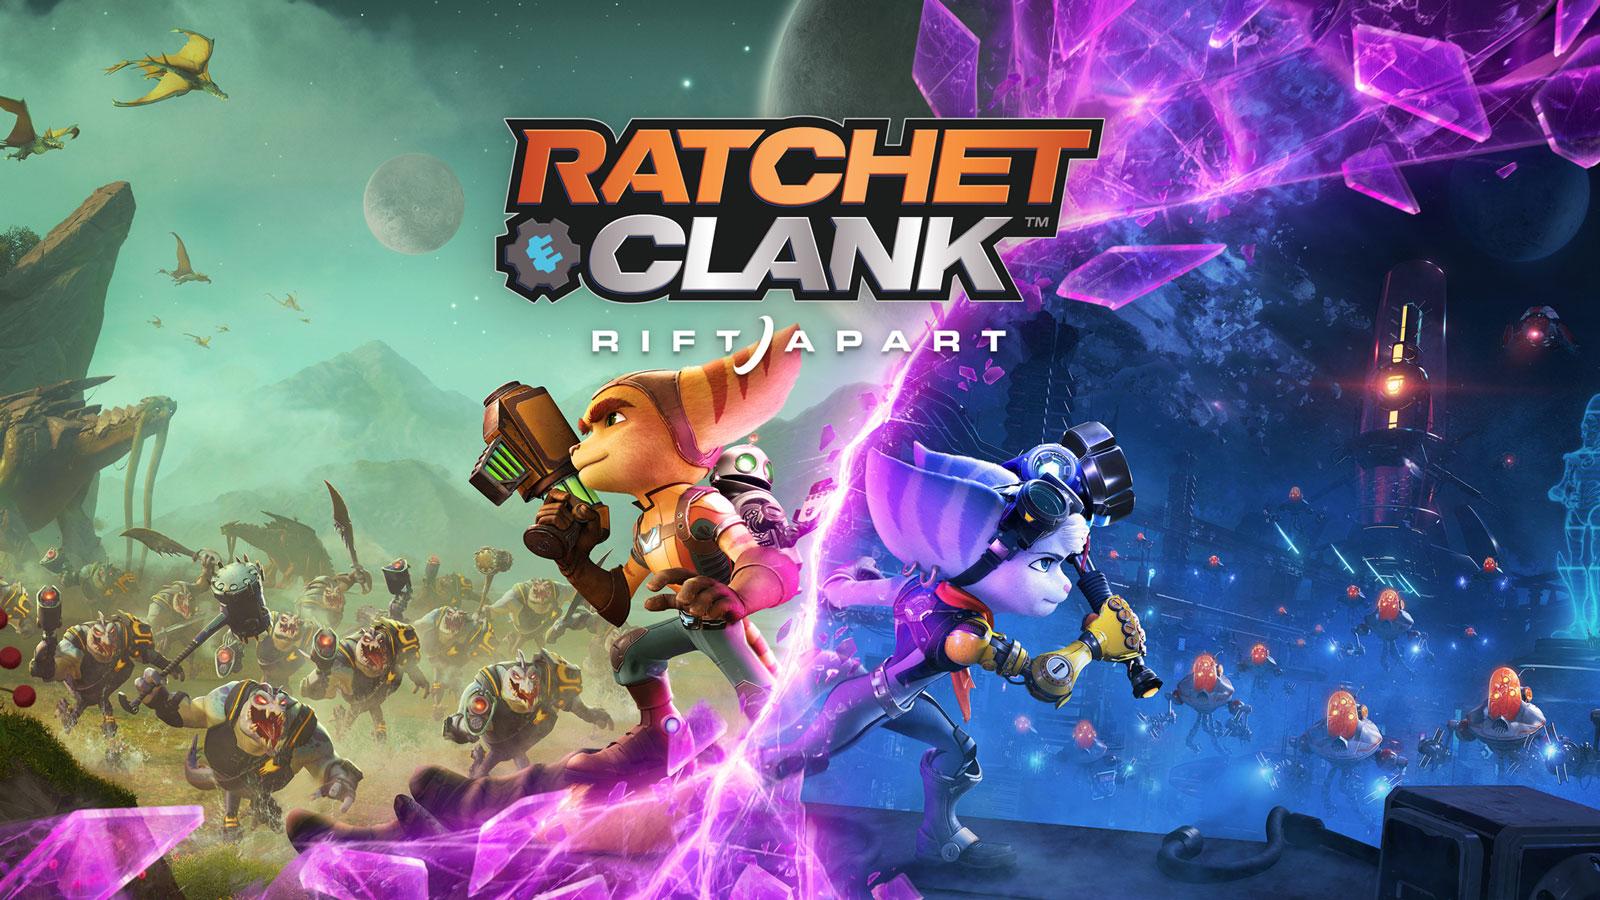 Free Ratchet & Clank: Rift Apart Wallpaper in 1600x900